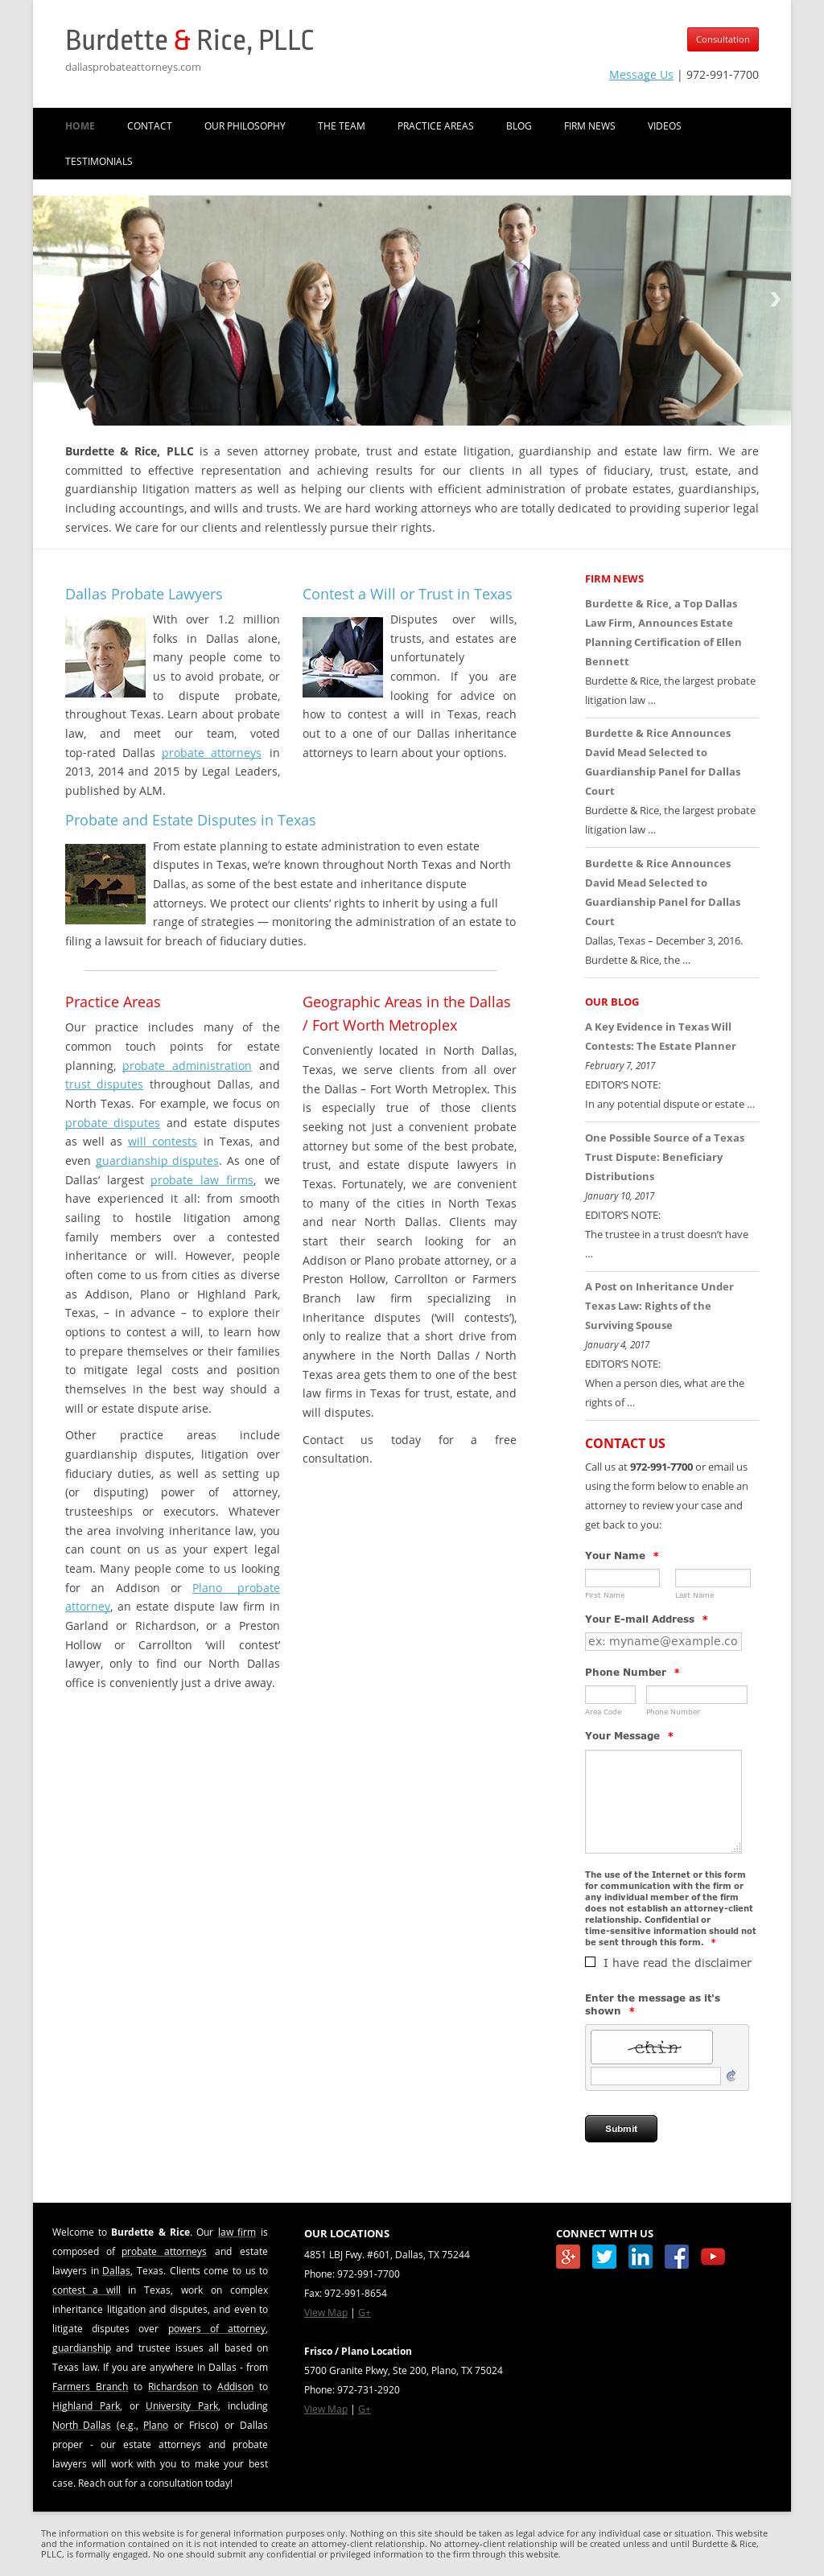 Owler Reports - Press Release: Dallasprobateattorneys : Burdette